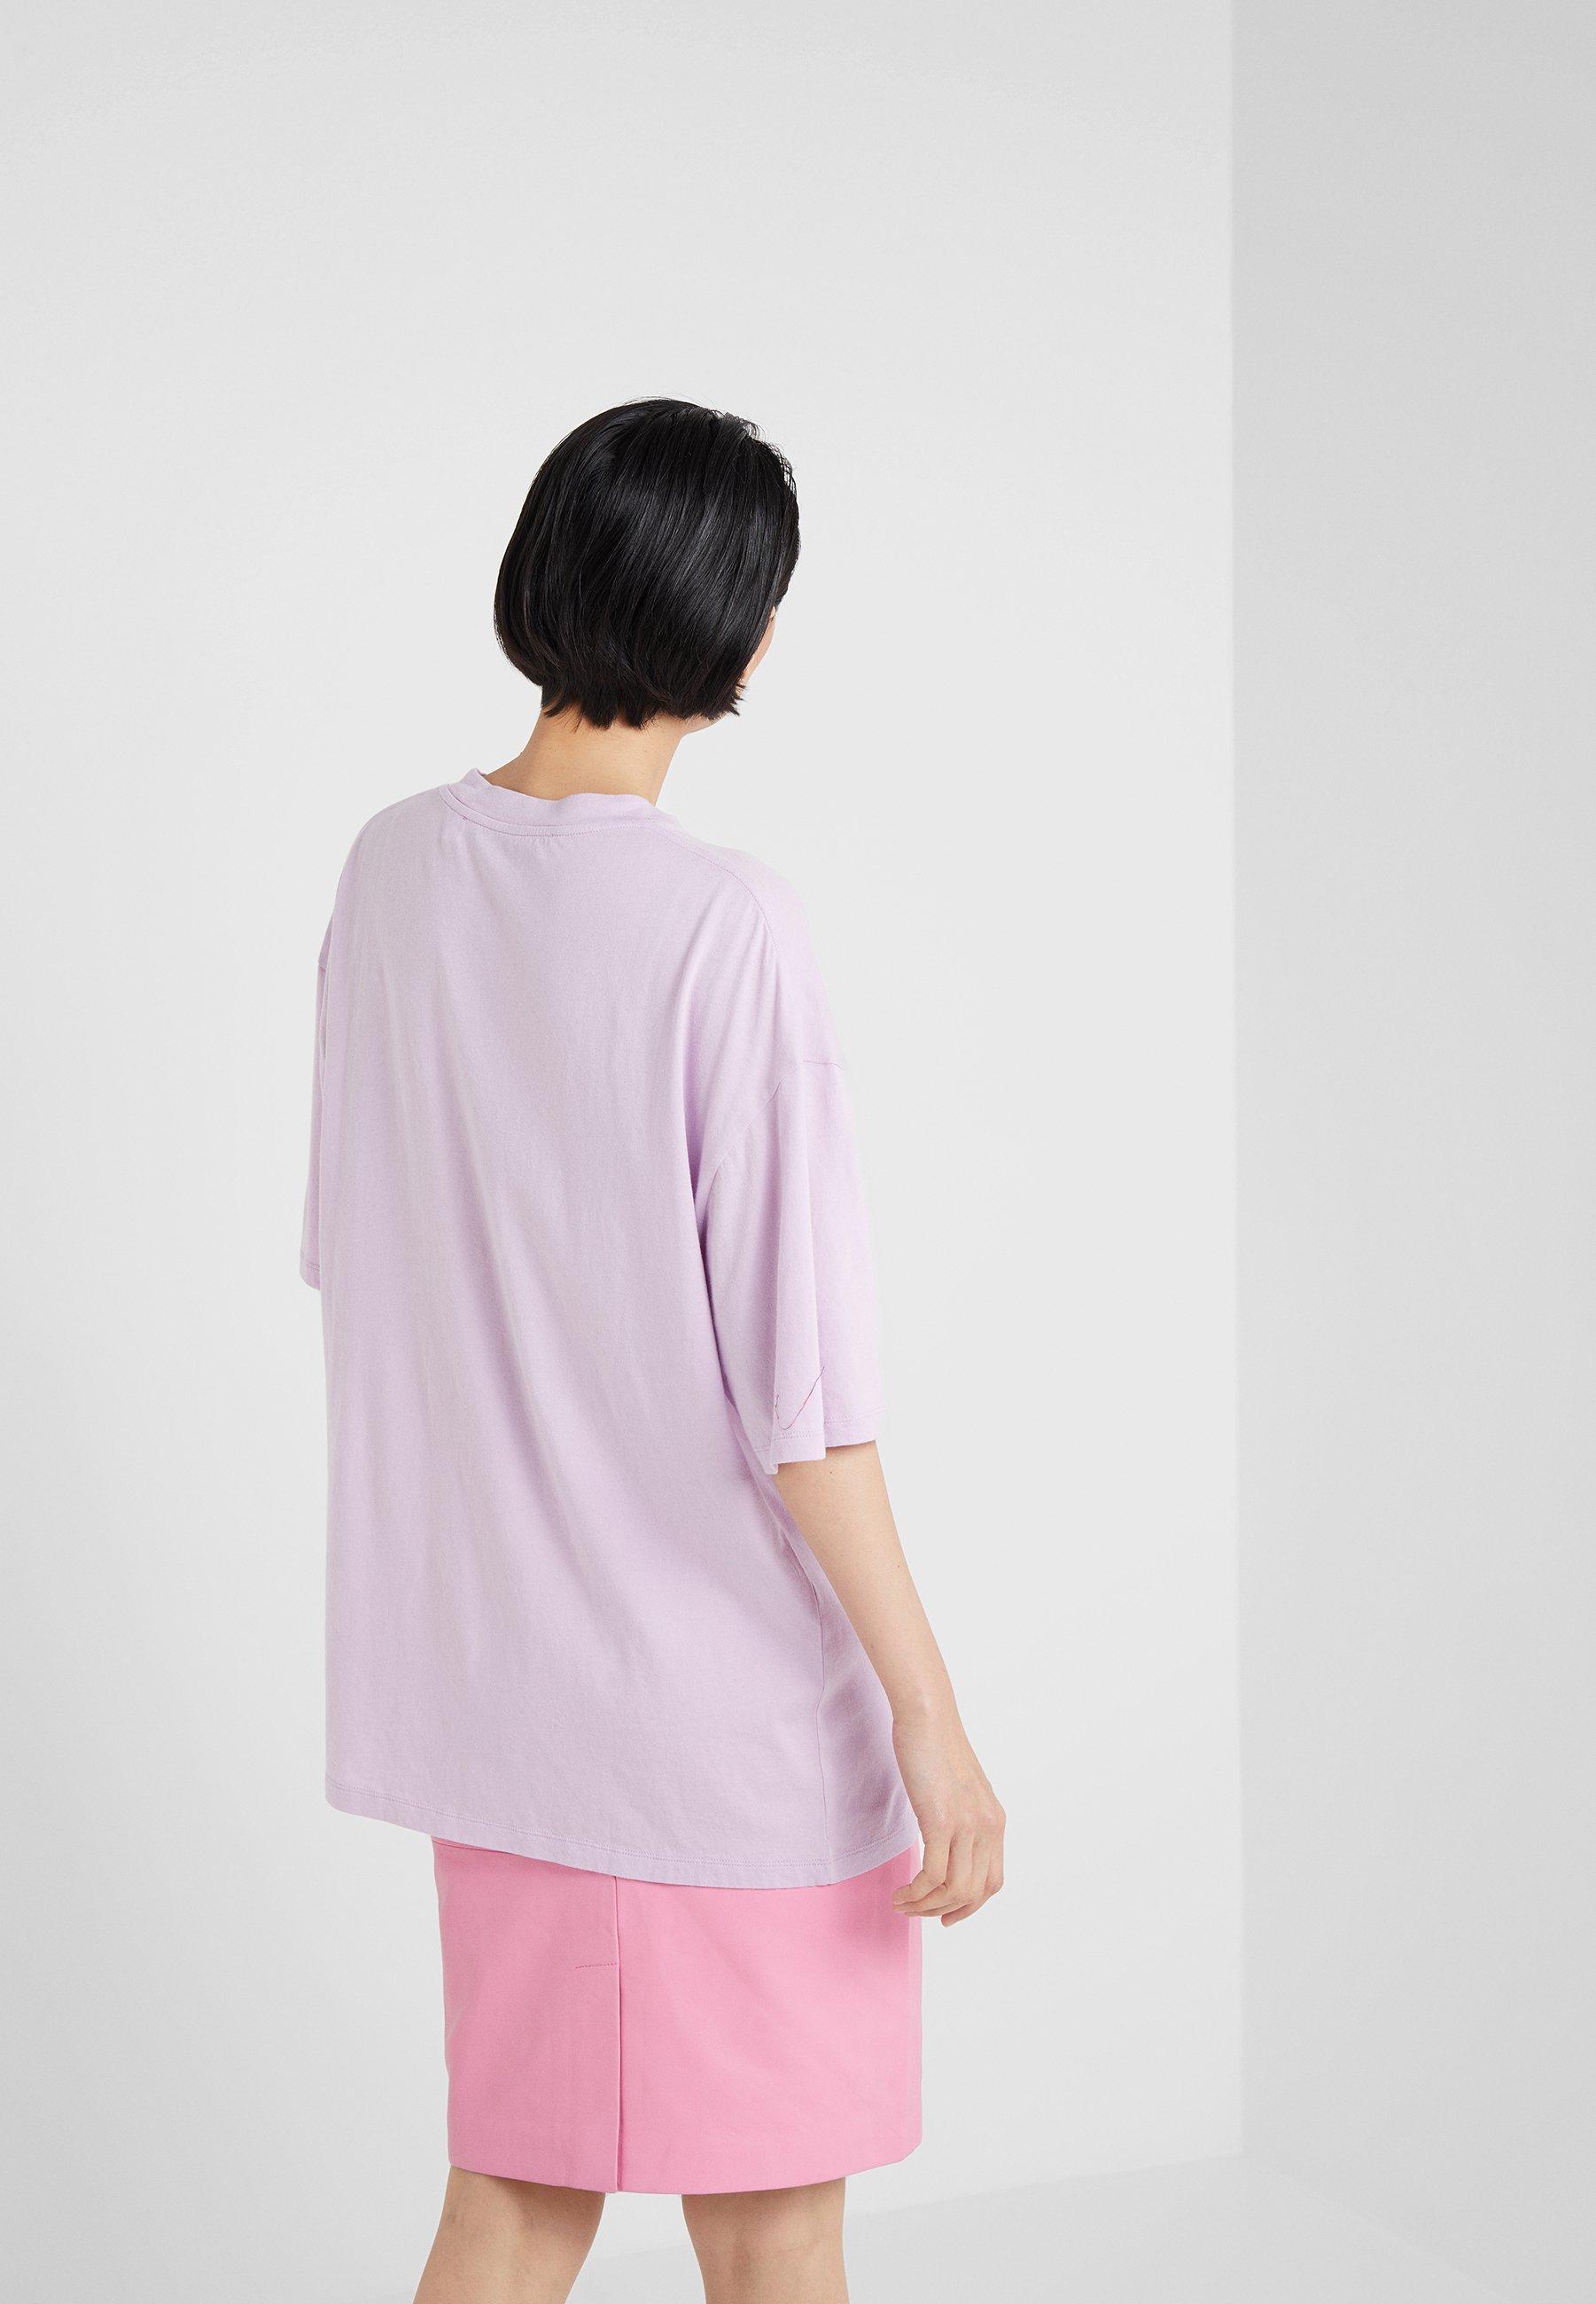 Imprimé Imprimé Iro Imprimé Iro Iro shirt SlaterT SlaterT SlaterT shirt Lavender shirt Lavender GUzqSMVp